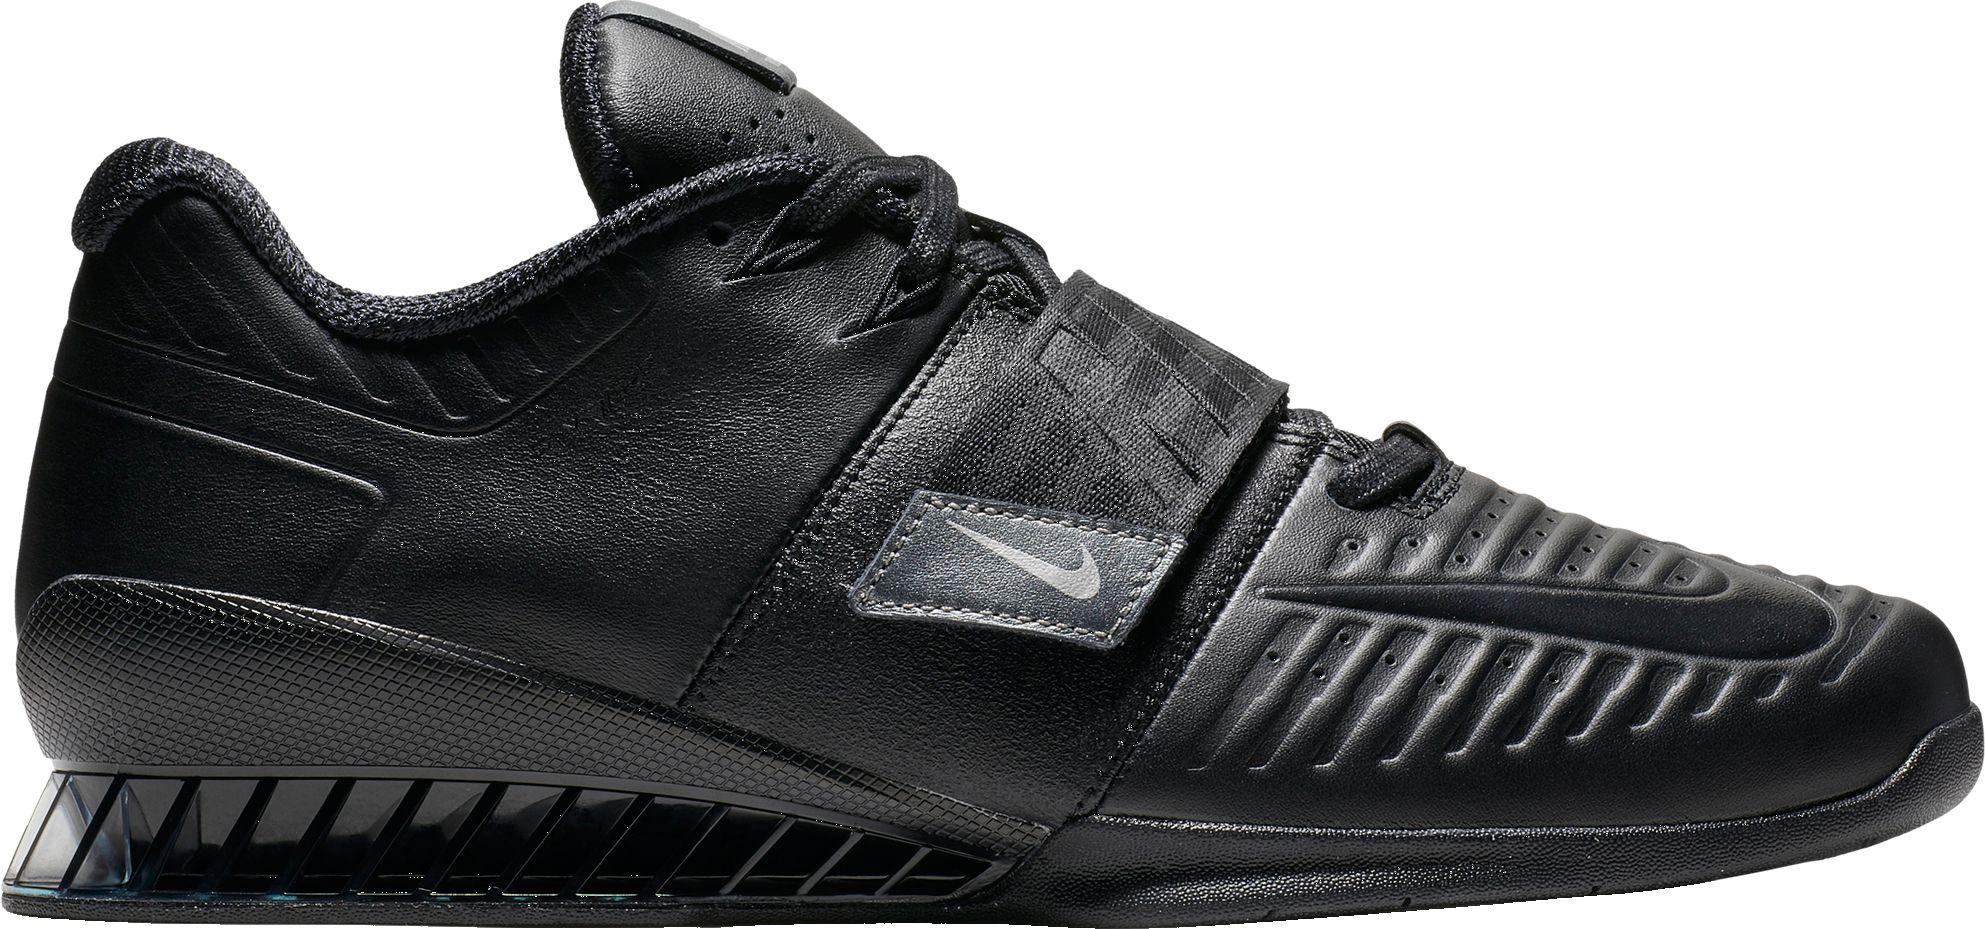 Nike Men's Romaleos 3.5 Weightlifting